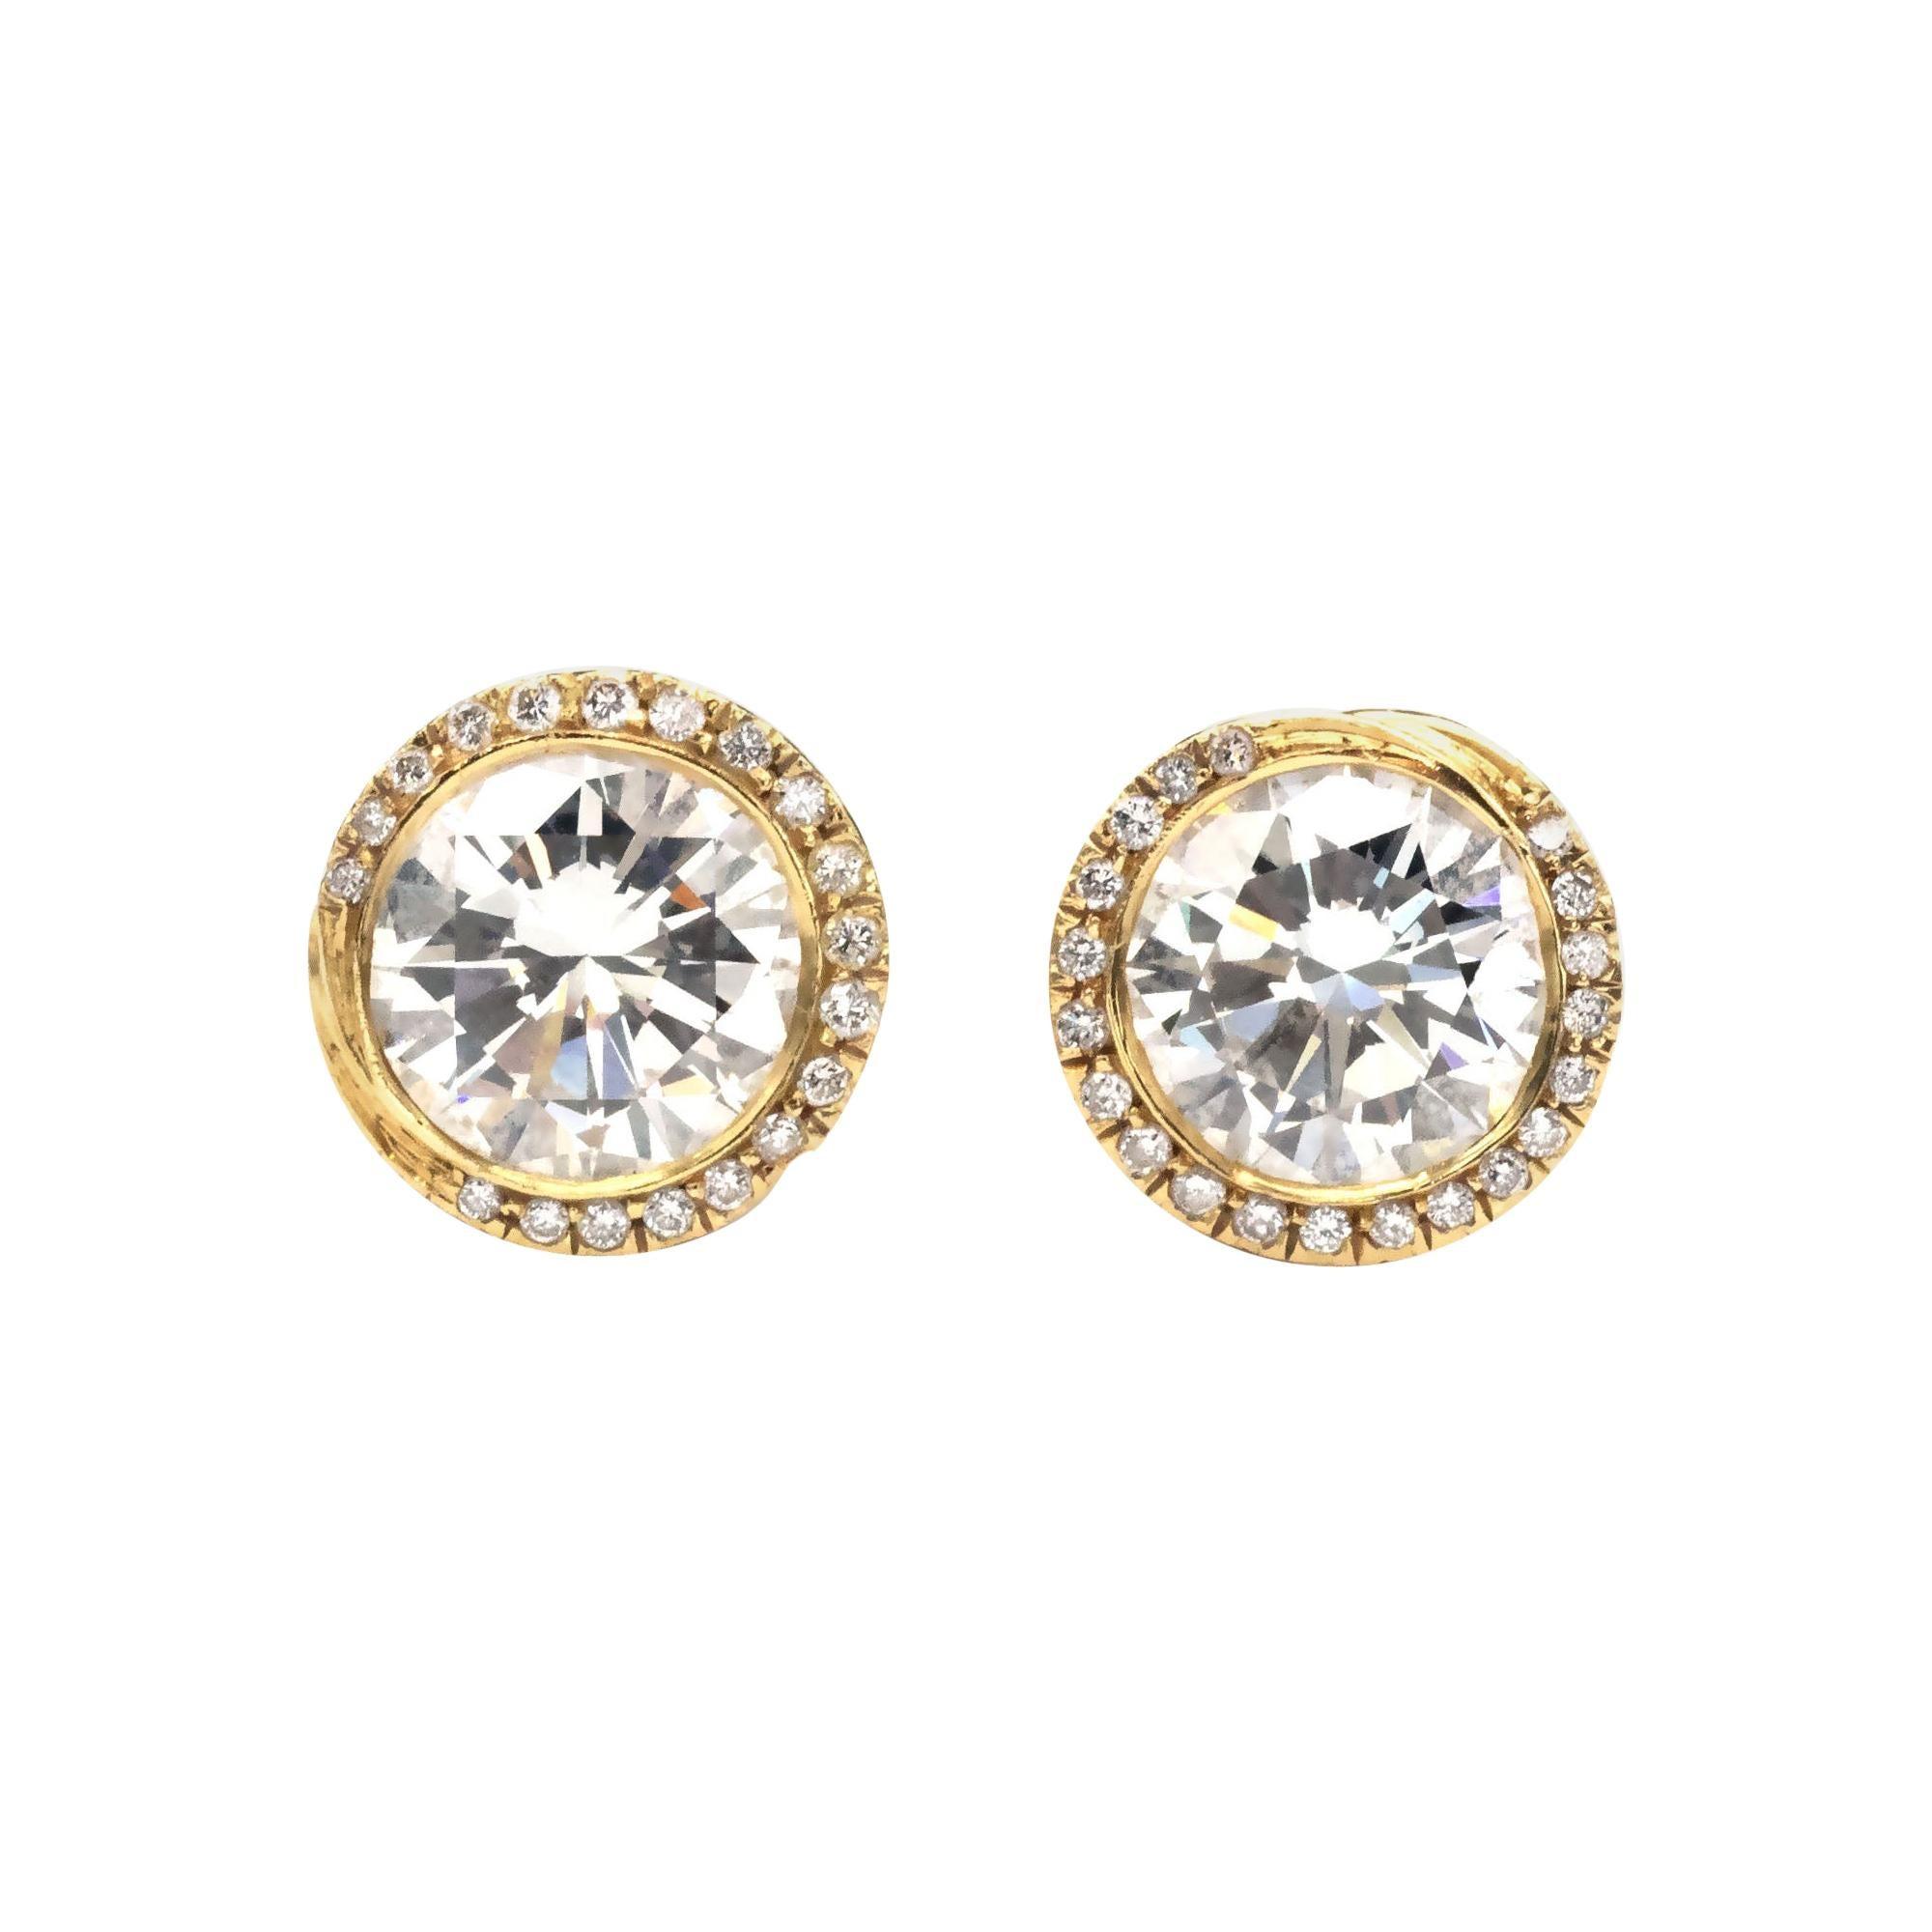 2.43 carat Diamond 18 Kt Hand Engraved Gold Stud Earrings